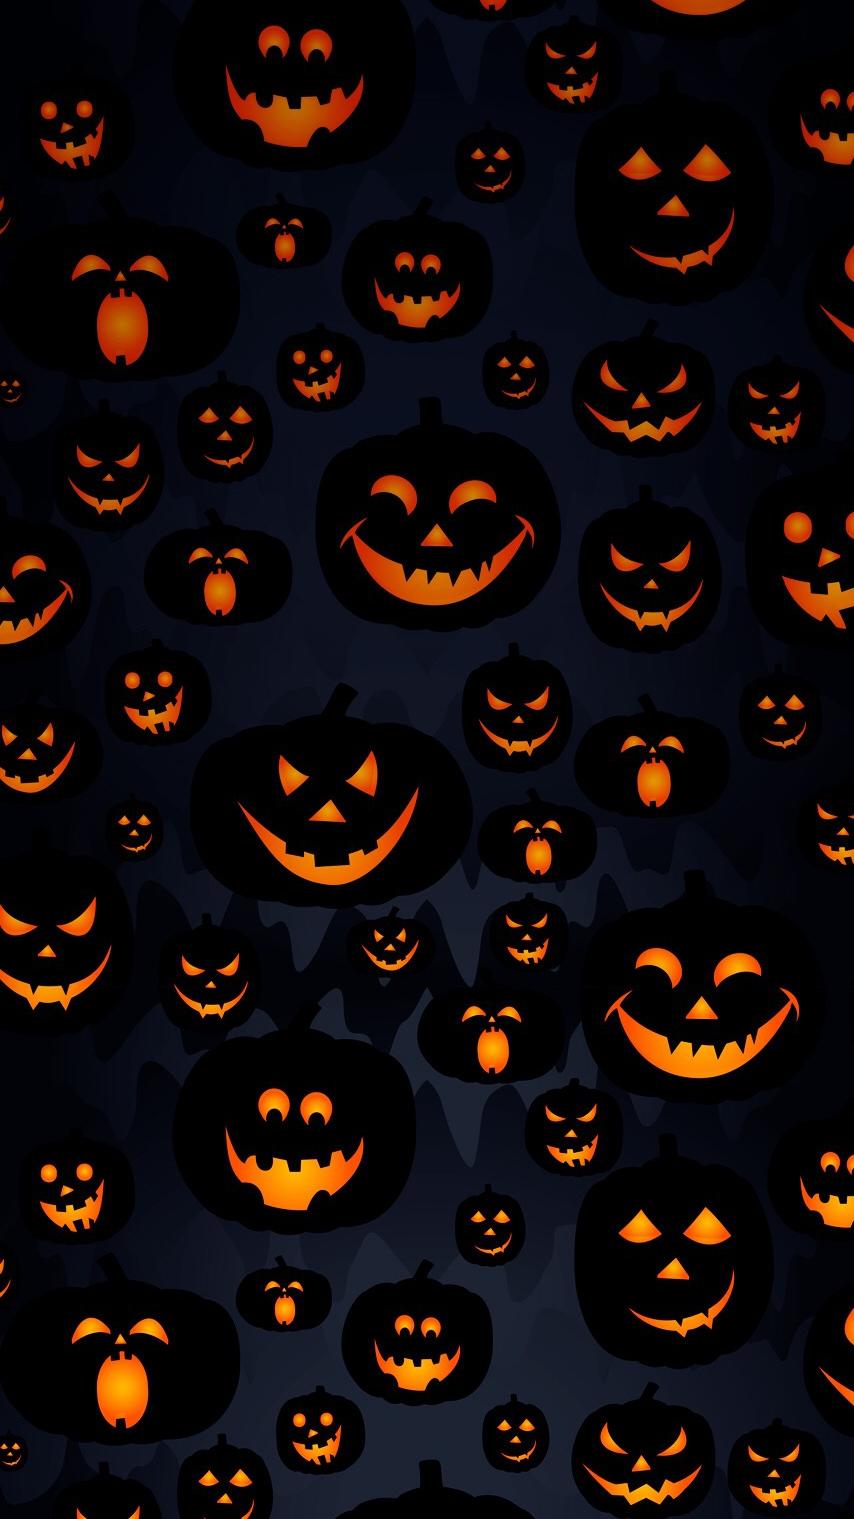 Cute Anime Love Phone Wallpaper Scary Halloween Pumpkin Masks Iphone Wallpaper Iphone